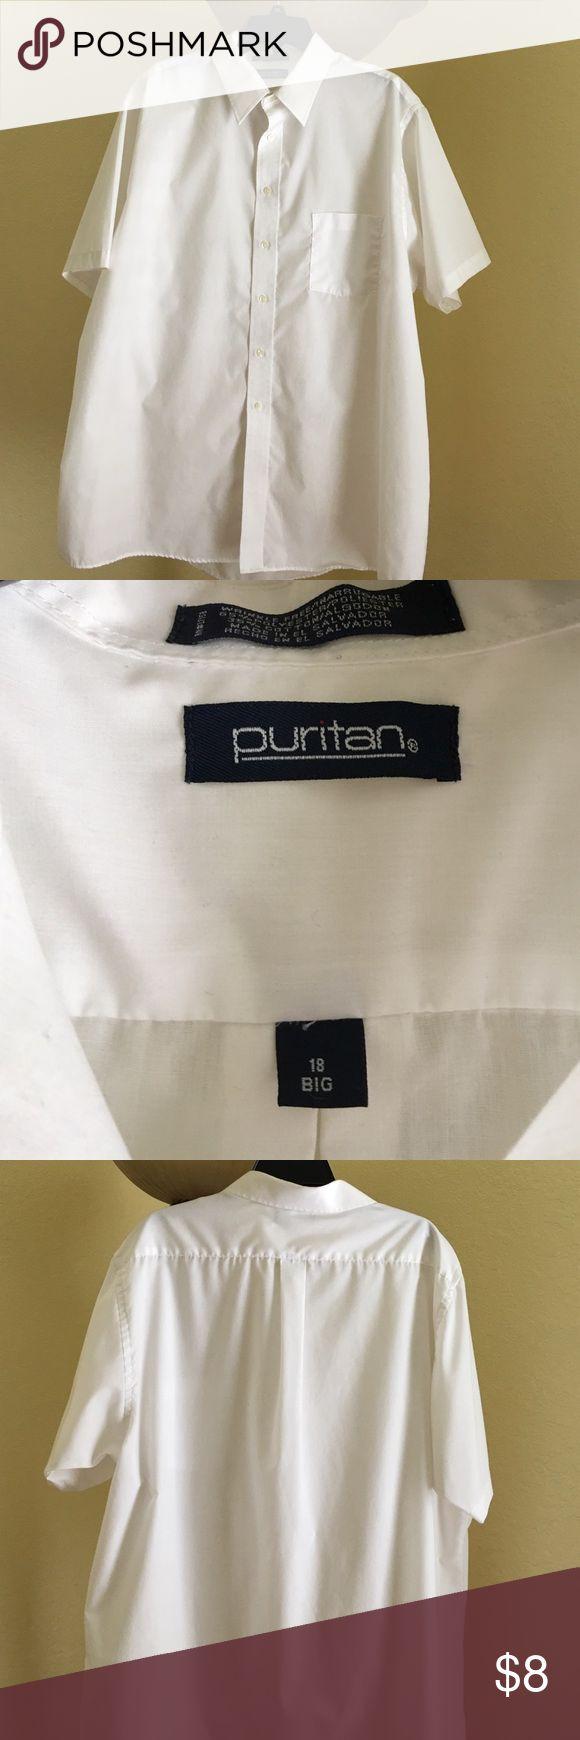 Men's short sleeve dress shirt size 18 big White mens dress shirt sleeve dress shirt size 18 big puritan Shirts Dress Shirts